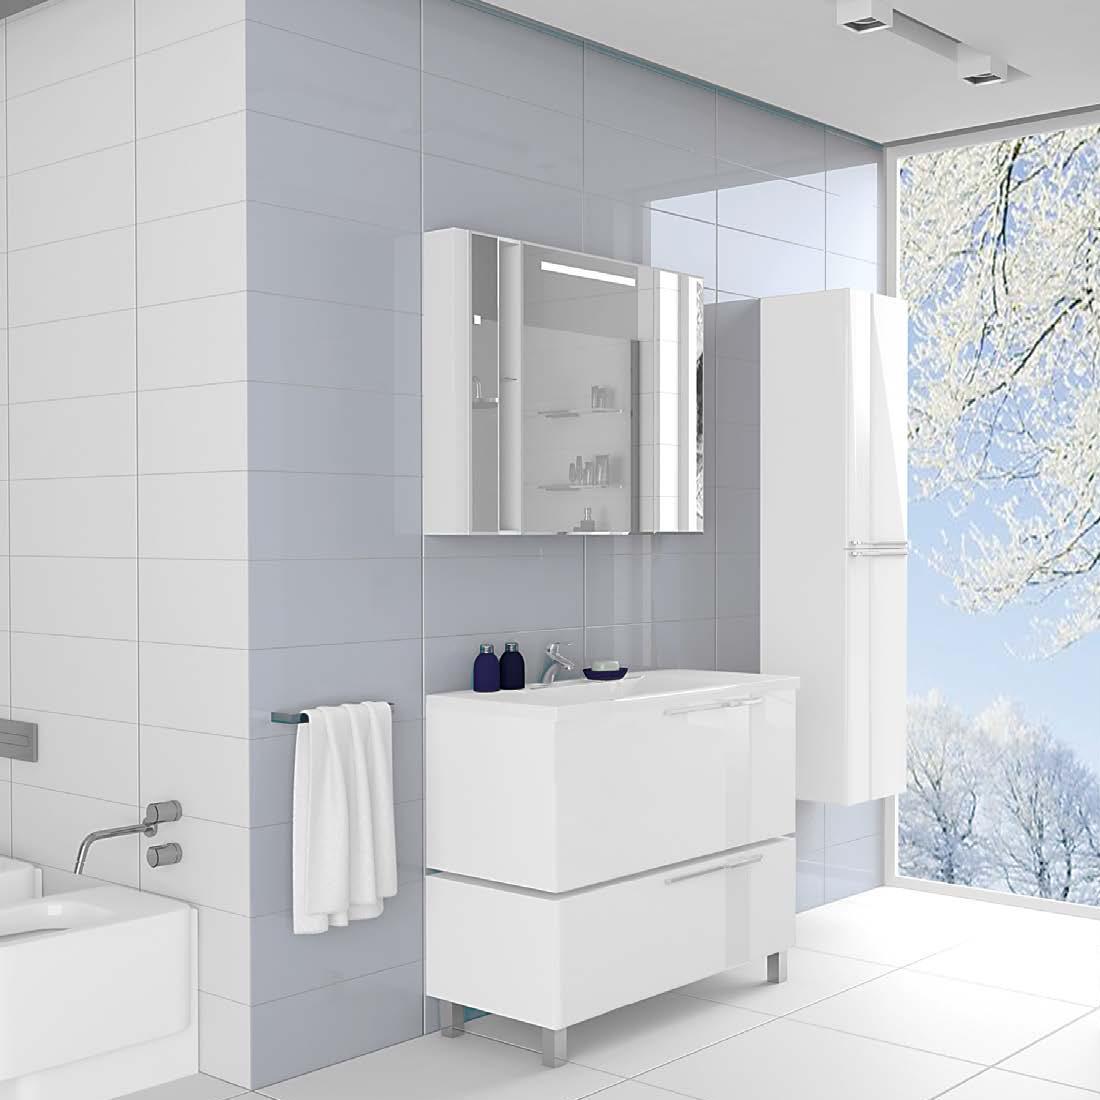 Сбор заказов. Мебель для ванной марка 1 Akvа-тon! Раковины, мойки, аксессуары- 28